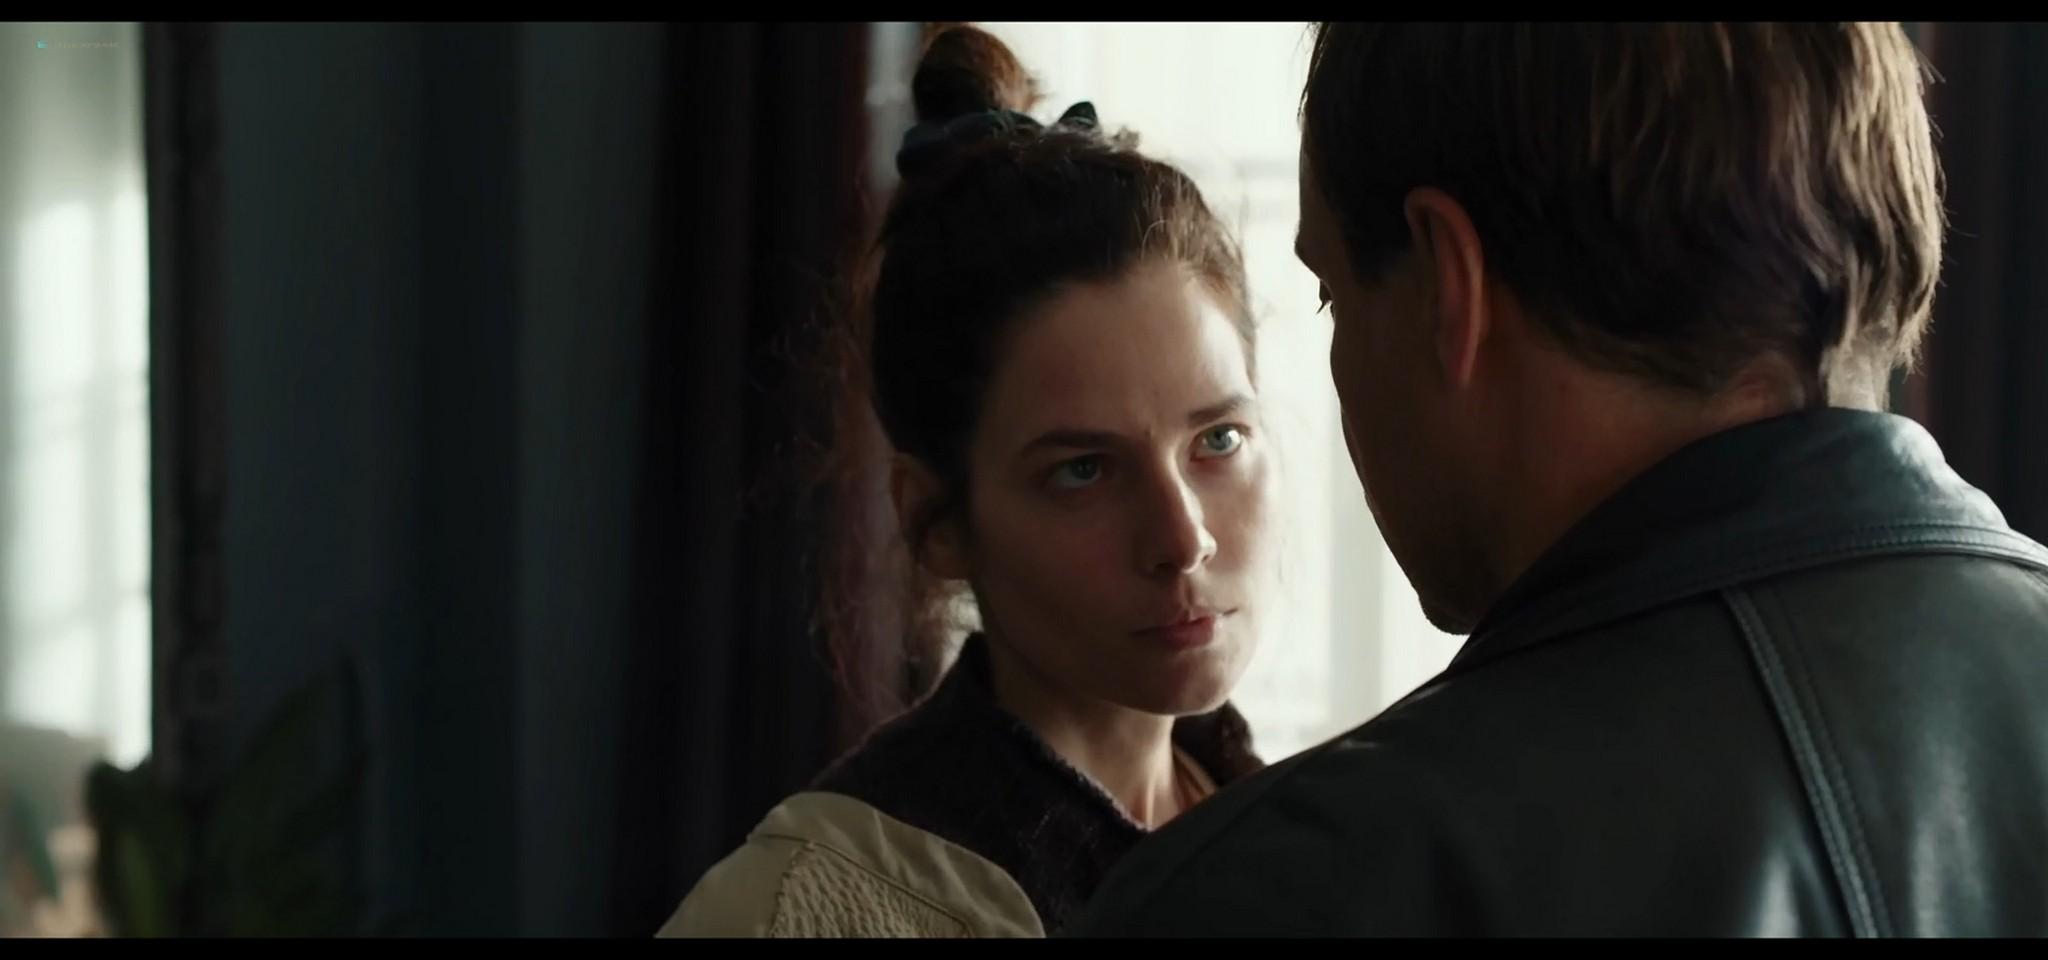 Yulia Snigir hot and some sex Anna Chipovskaya, Yuliya Peresild sexy - The End of the Season (2019) HD 1080p Web (10)